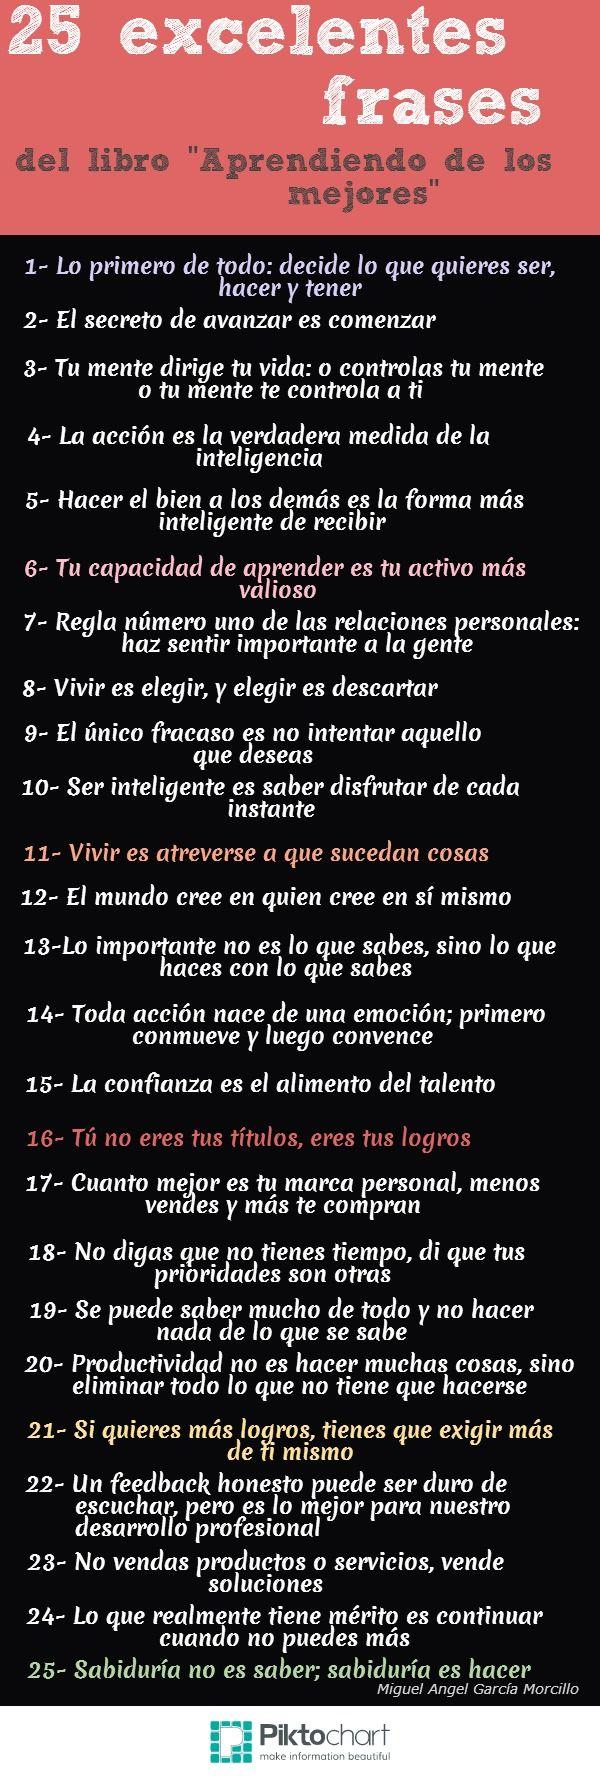 25 frases excelentes #vida #vivefeliz #happyness #lifestyle